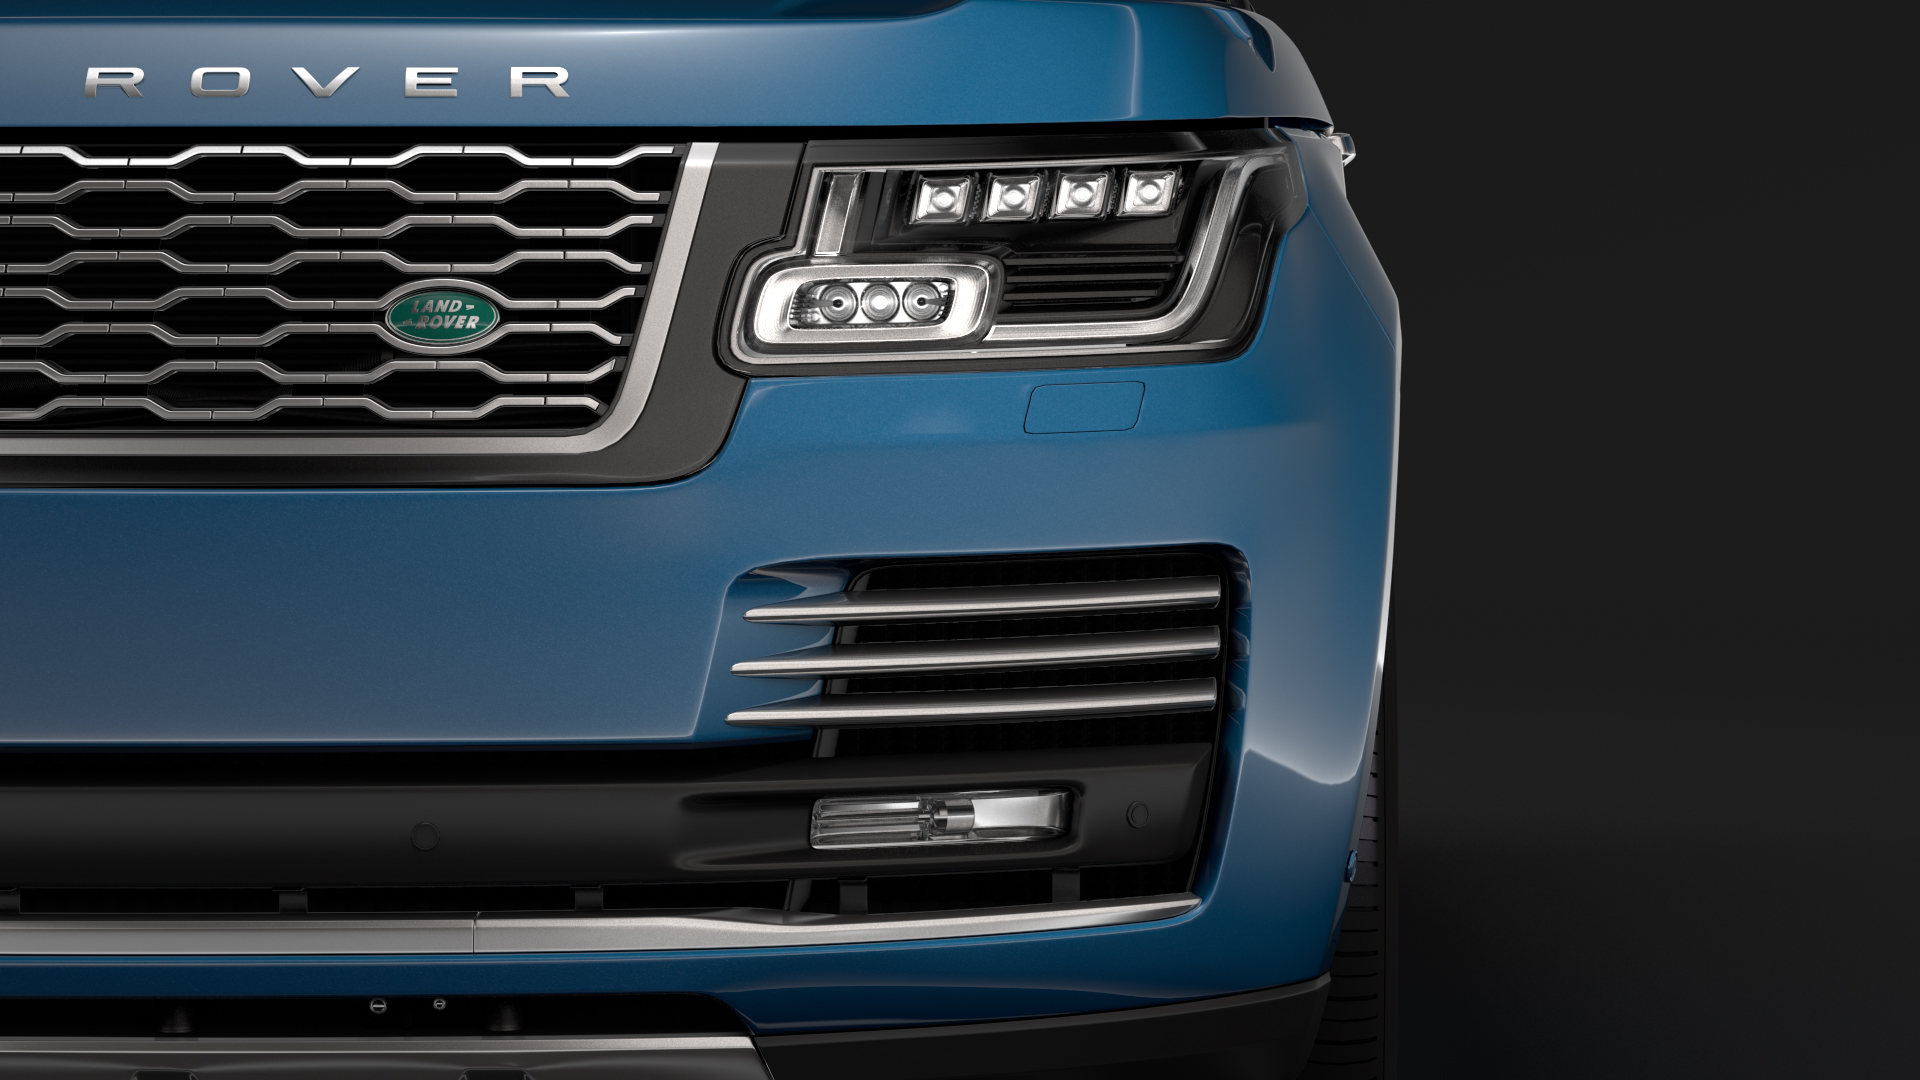 range rover autobiography lwb l405 2018 3d model max fbx c4d lwo ma mb hrc xsi obj 277325